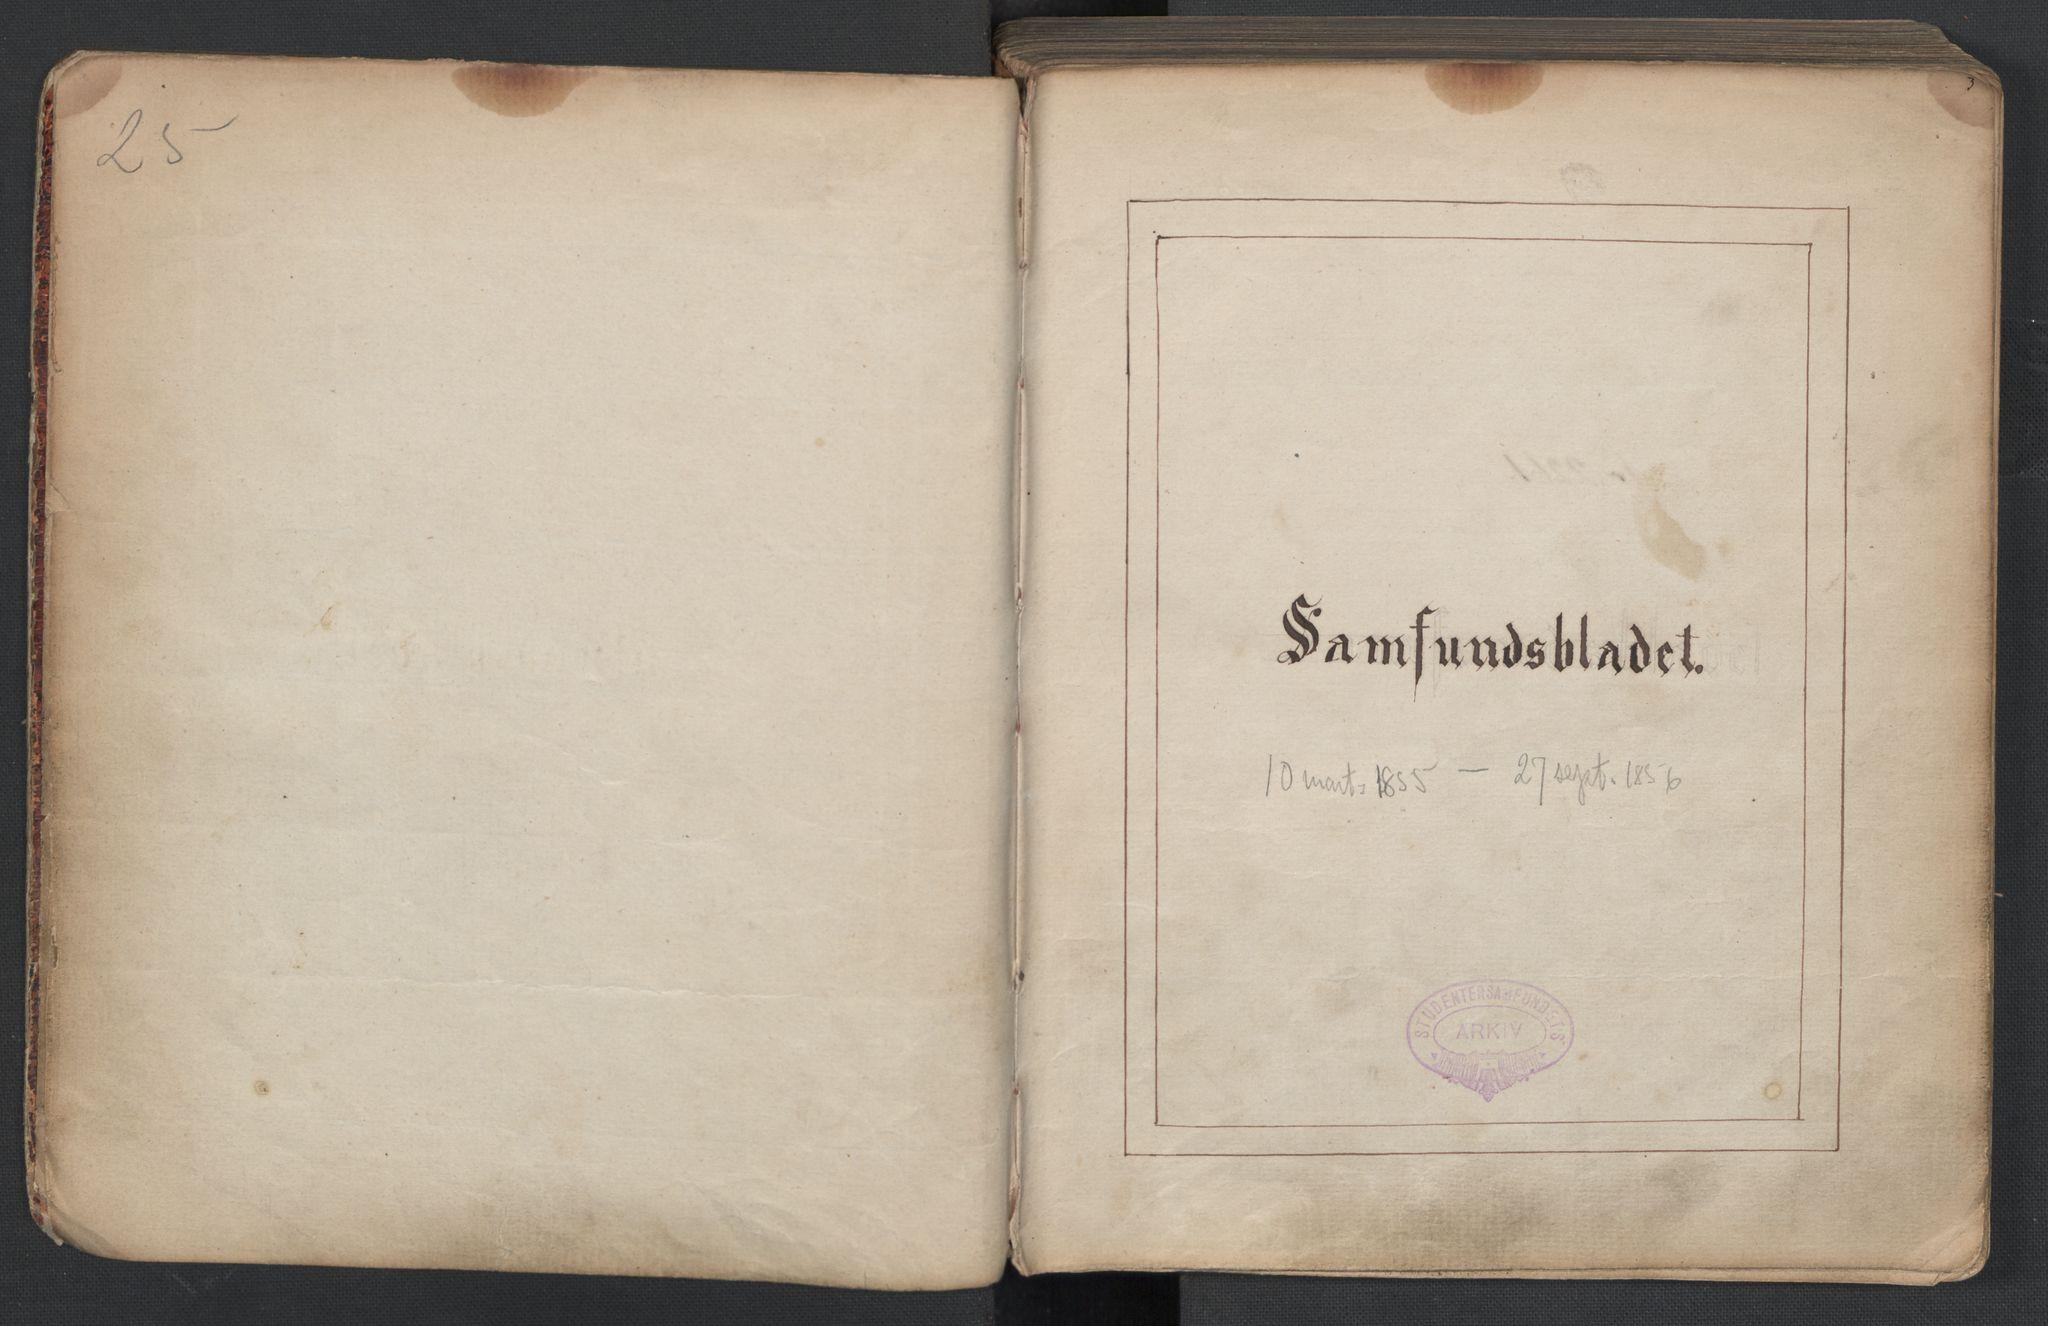 RA, Det Norske Studentersamfund, X/Xa/L0005, 1855-1856, s. 3